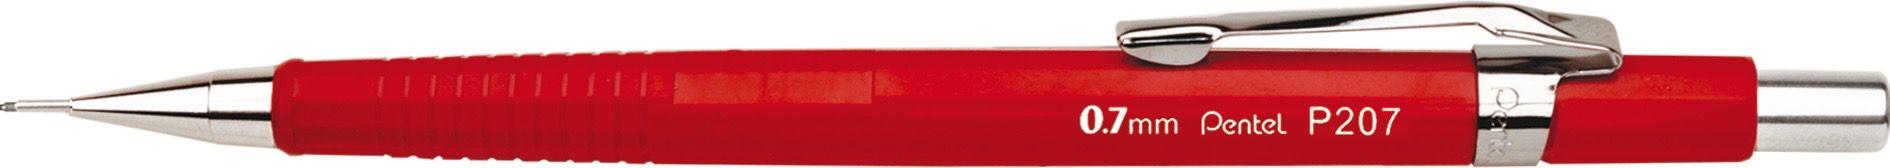 Lapiseira 0.7mm Pentel Sharp P207FRPB - Vermelho Vivo